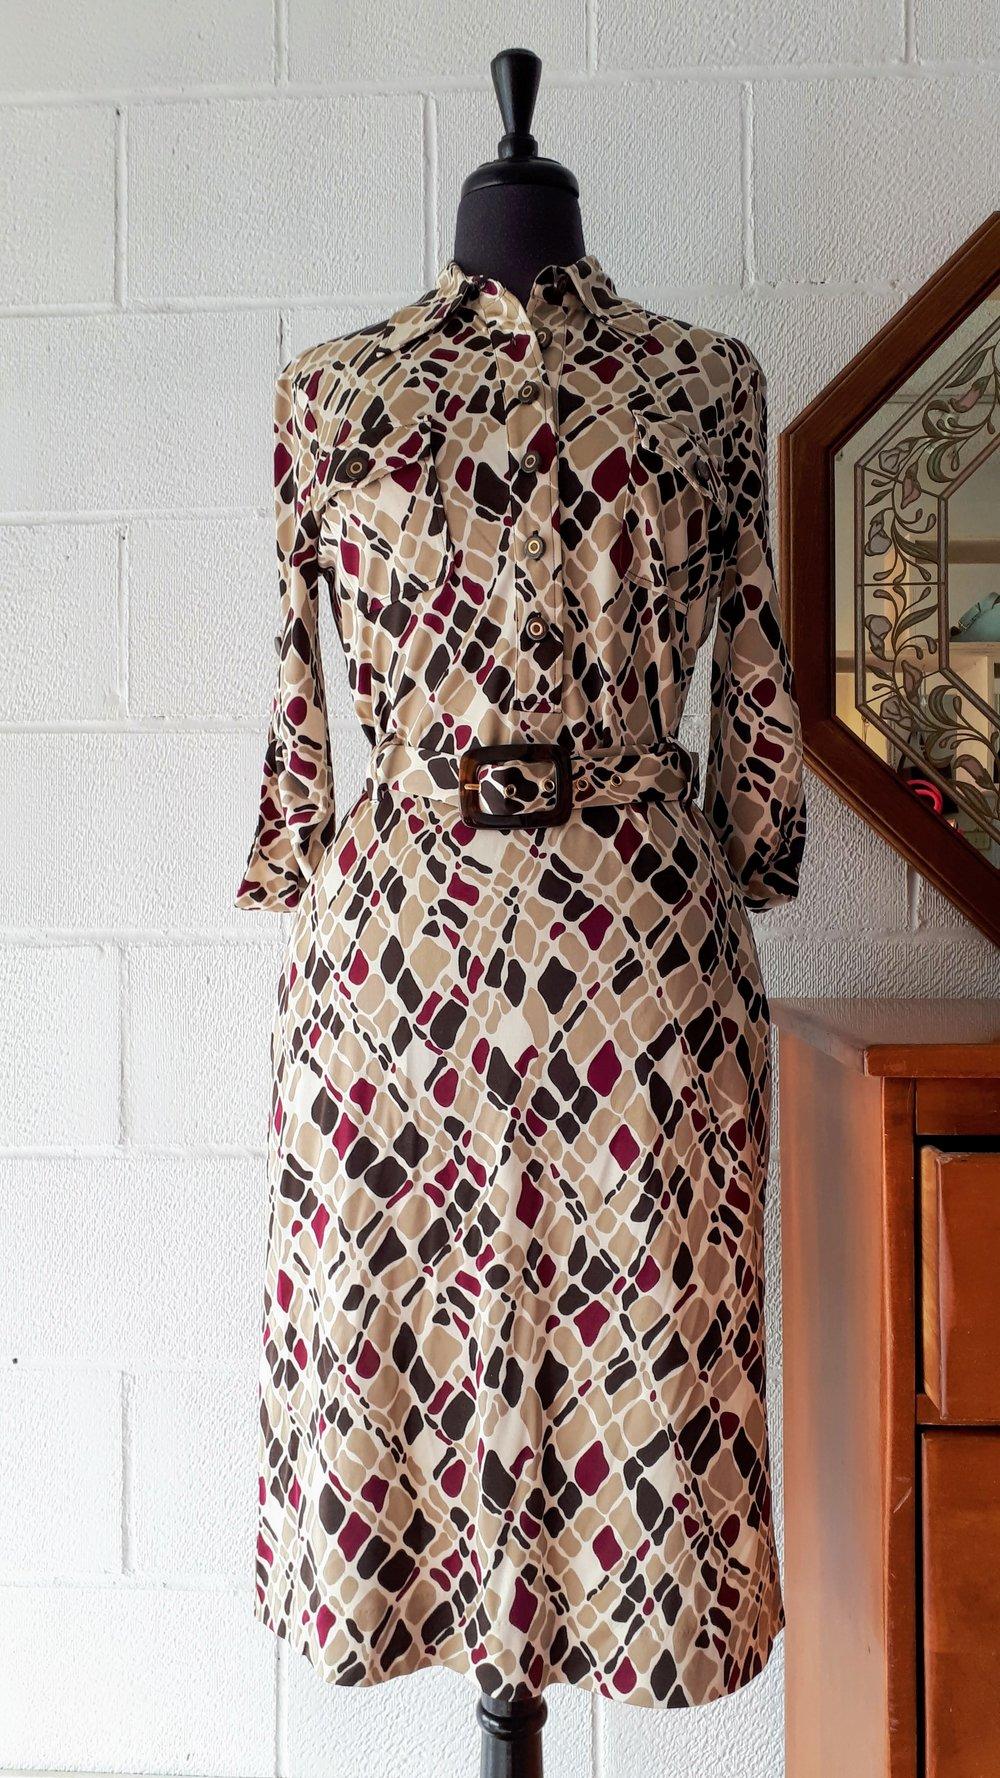 Tory Burch dress; Size M, $85